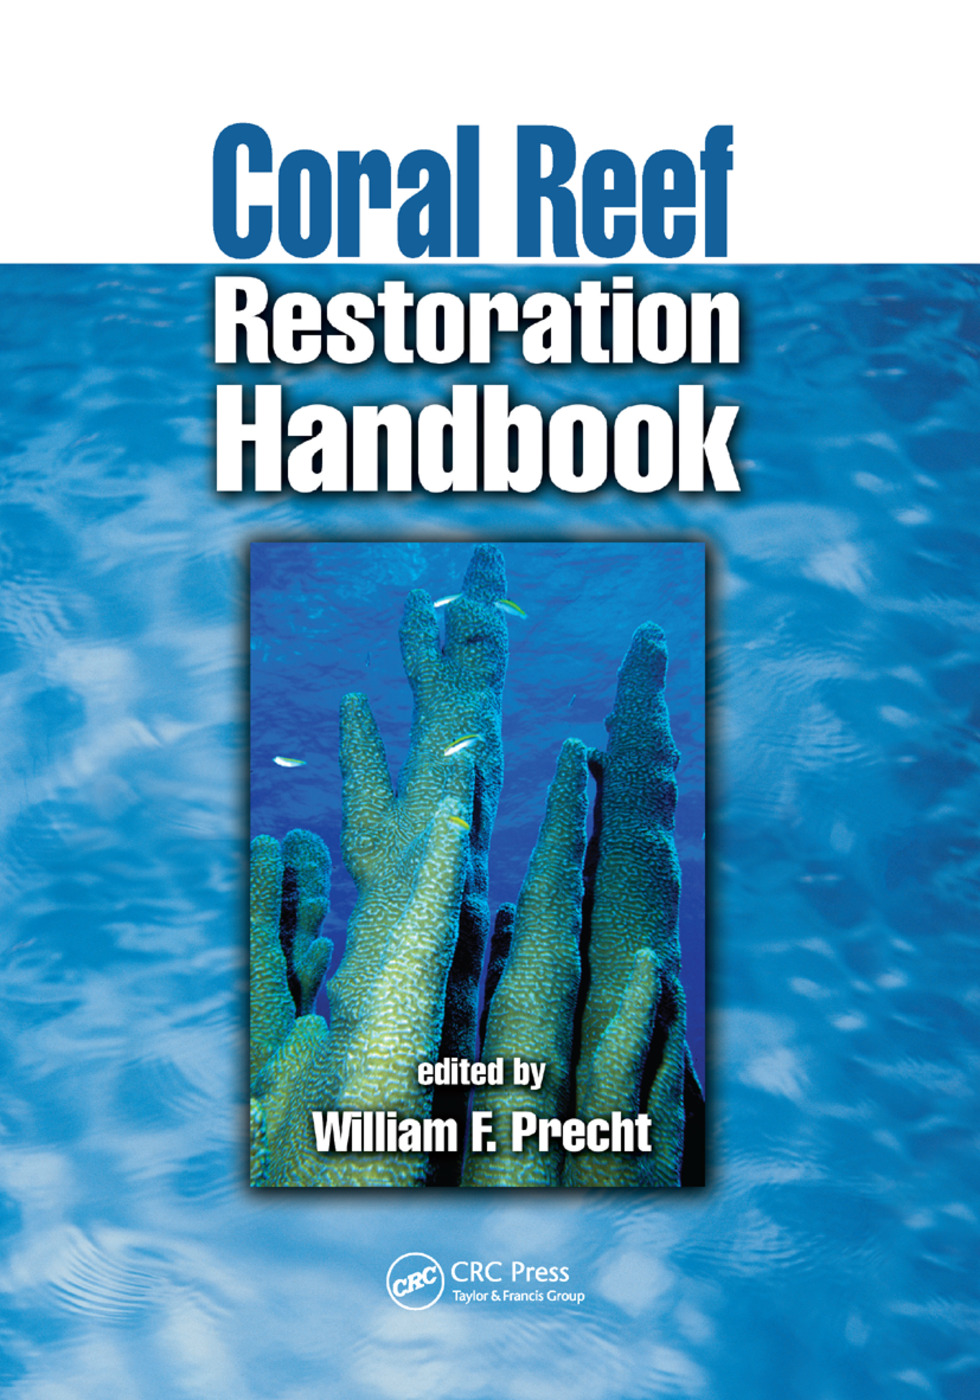 Coral Reef Restoration Handbook: 1st Edition (Paperback) book cover